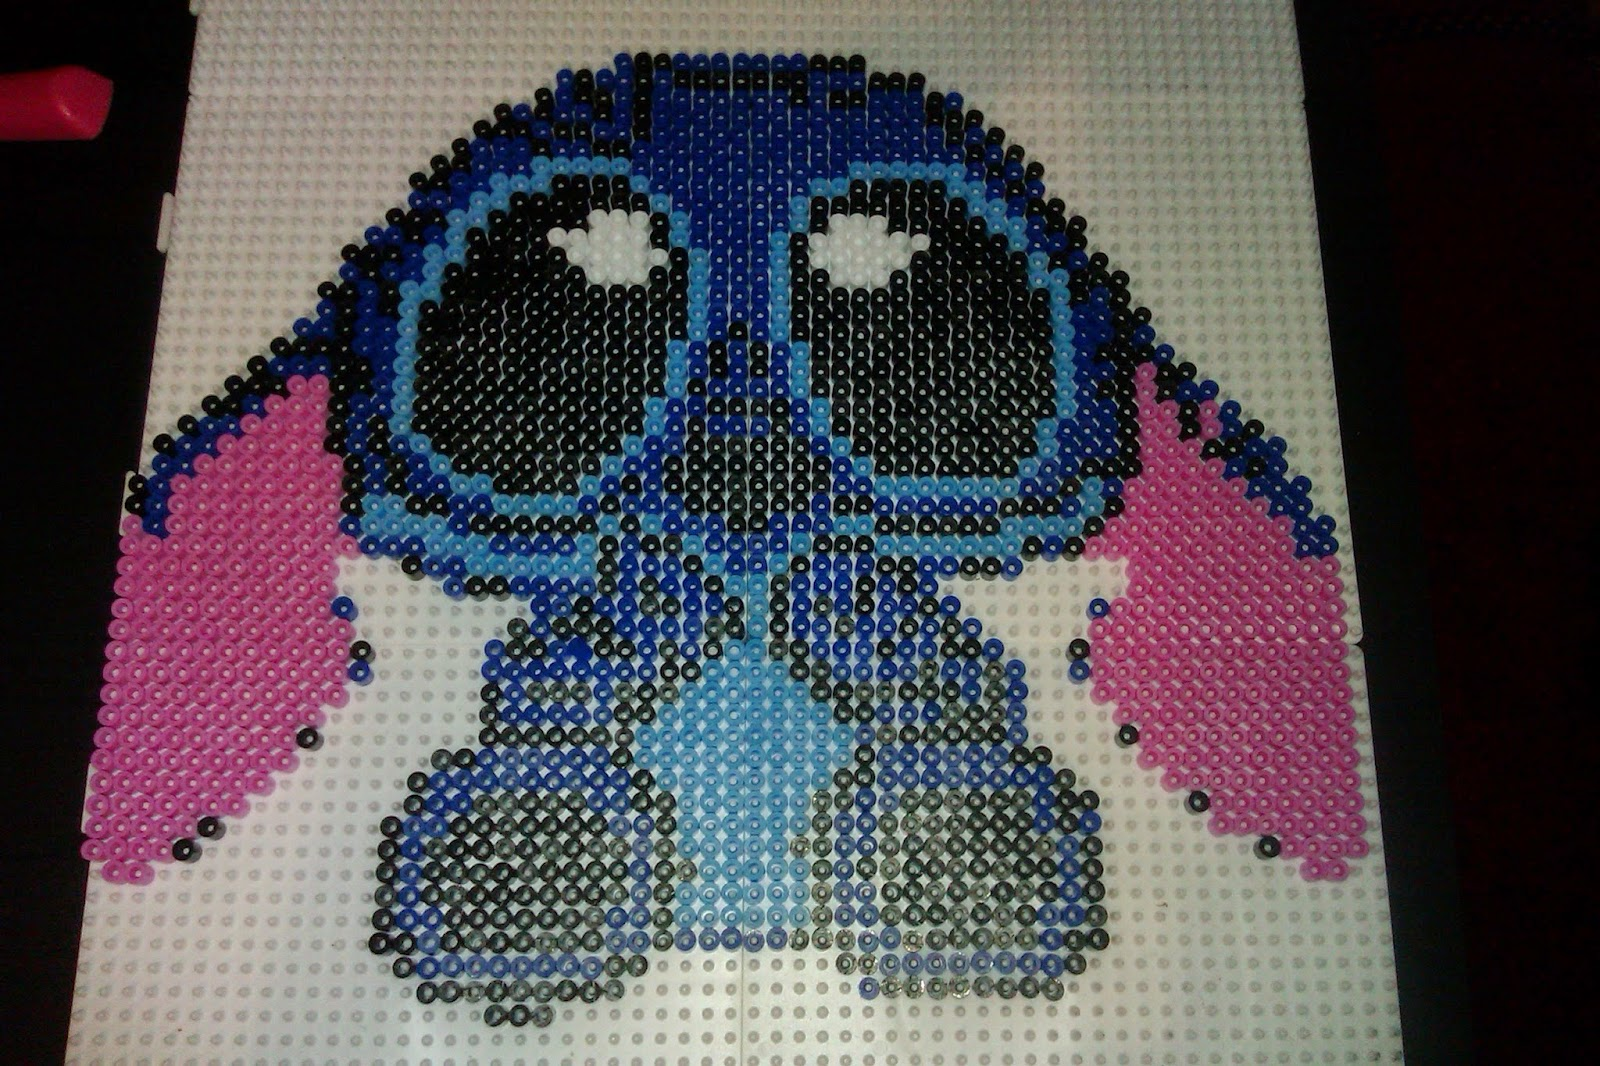 Relativ pixel art en perle hama: deviantart : bébé stitch en perle hama XT23